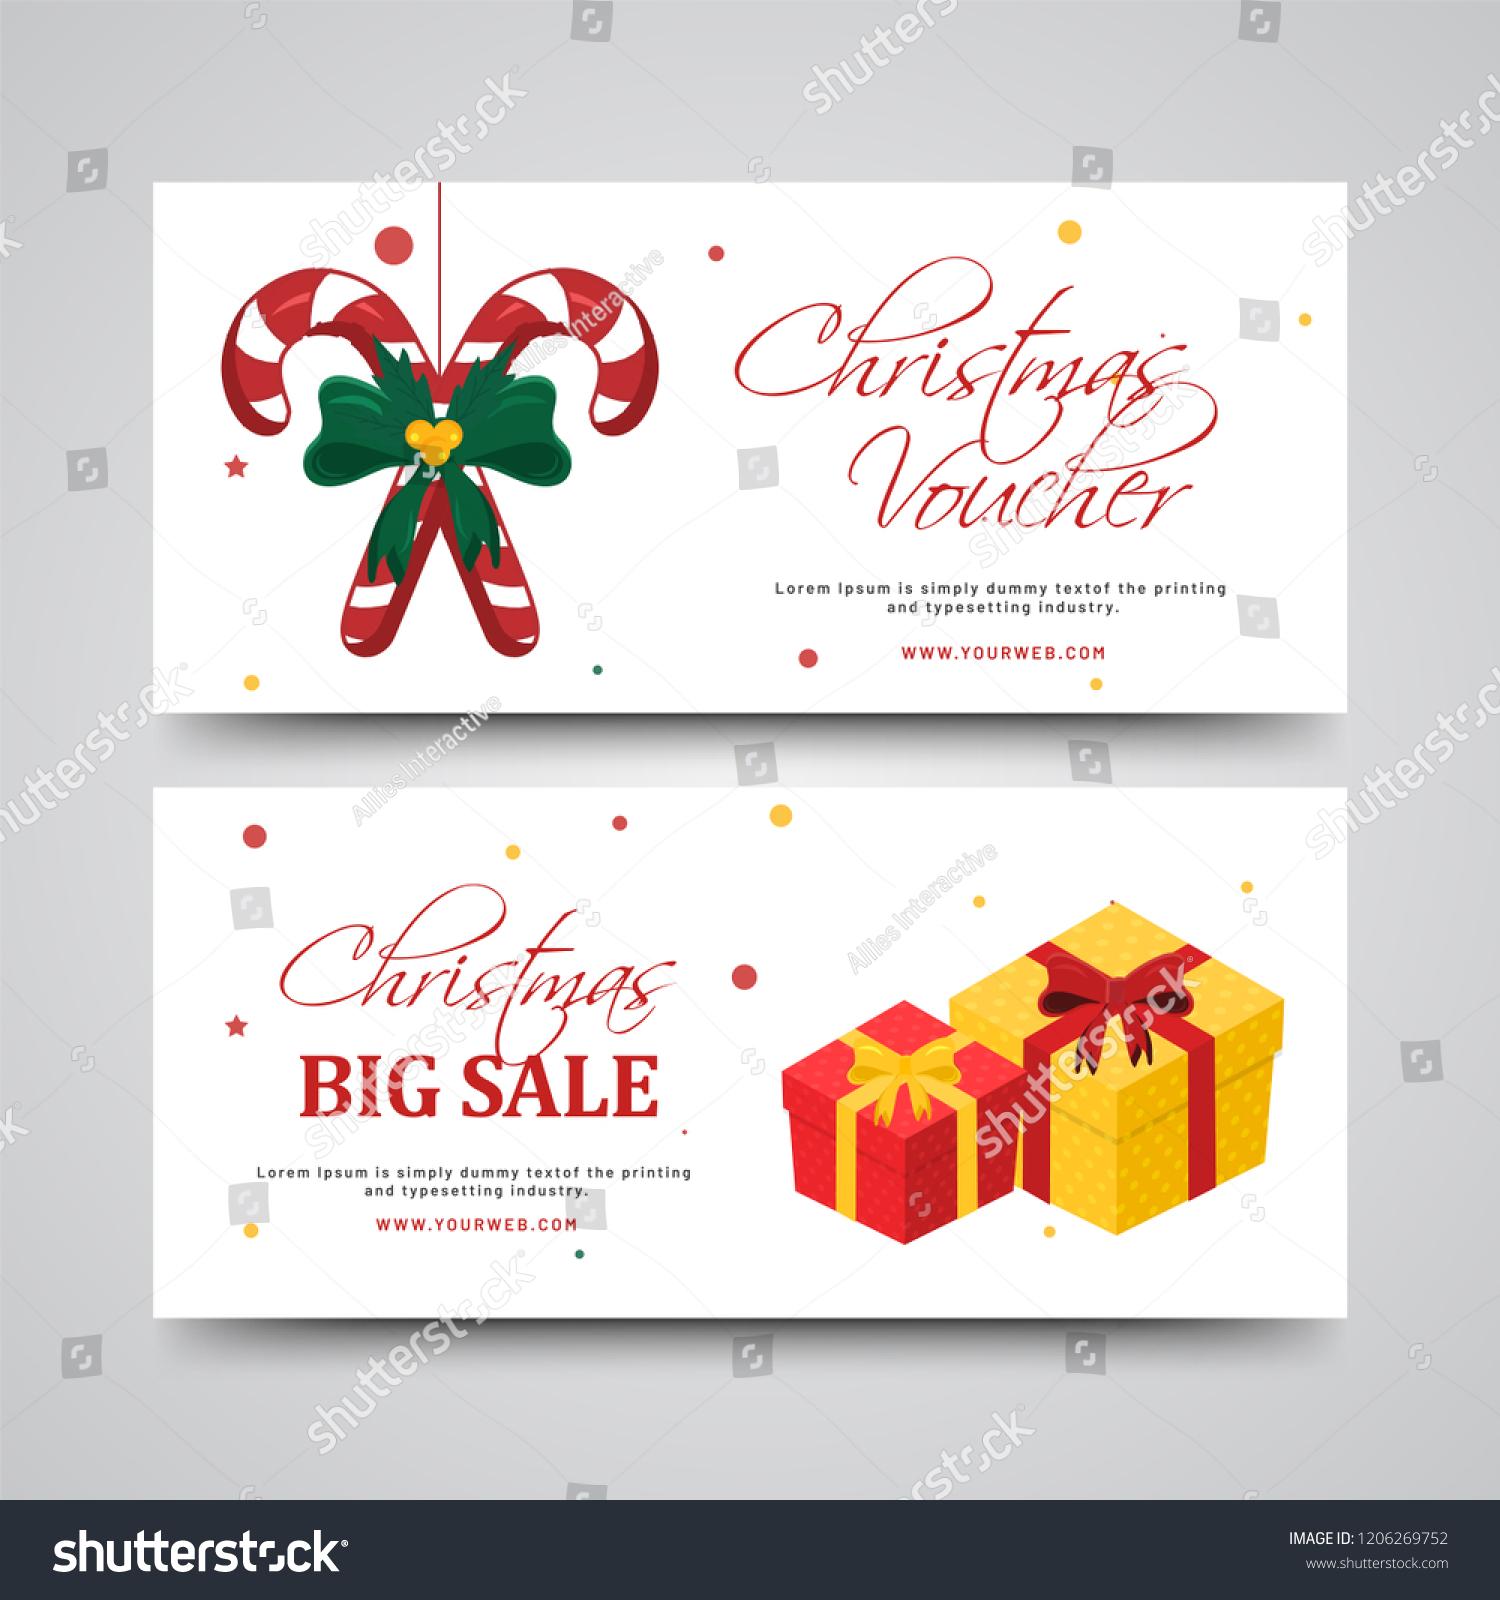 Big Sale Christmas Gift Voucher Illustration Stock Vector Royalty